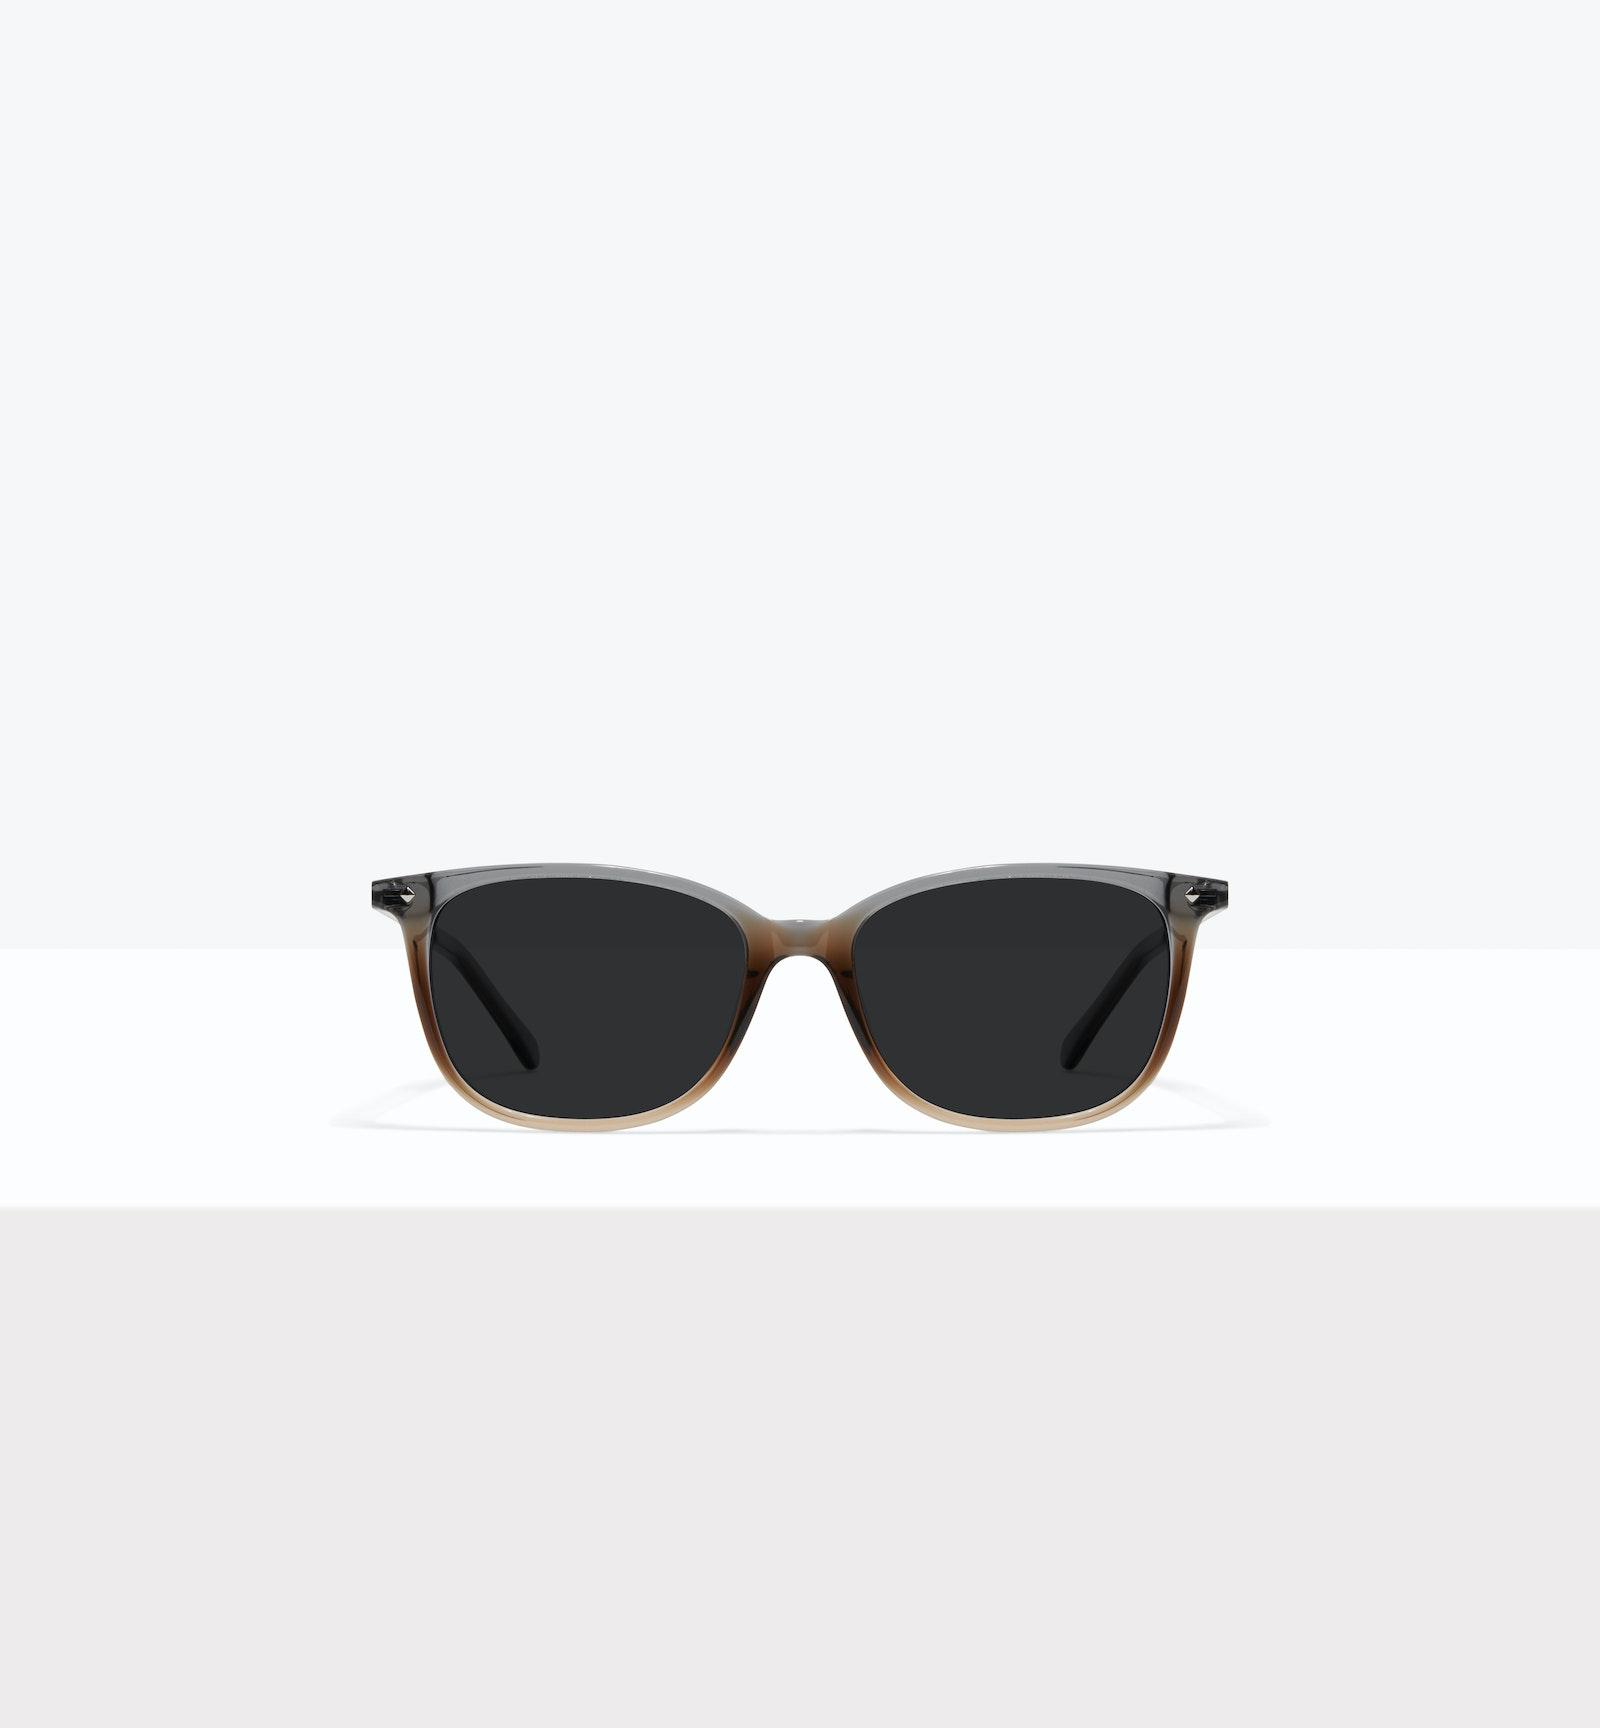 Affordable Fashion Glasses Rectangle Square Sunglasses Women Refine S Fog